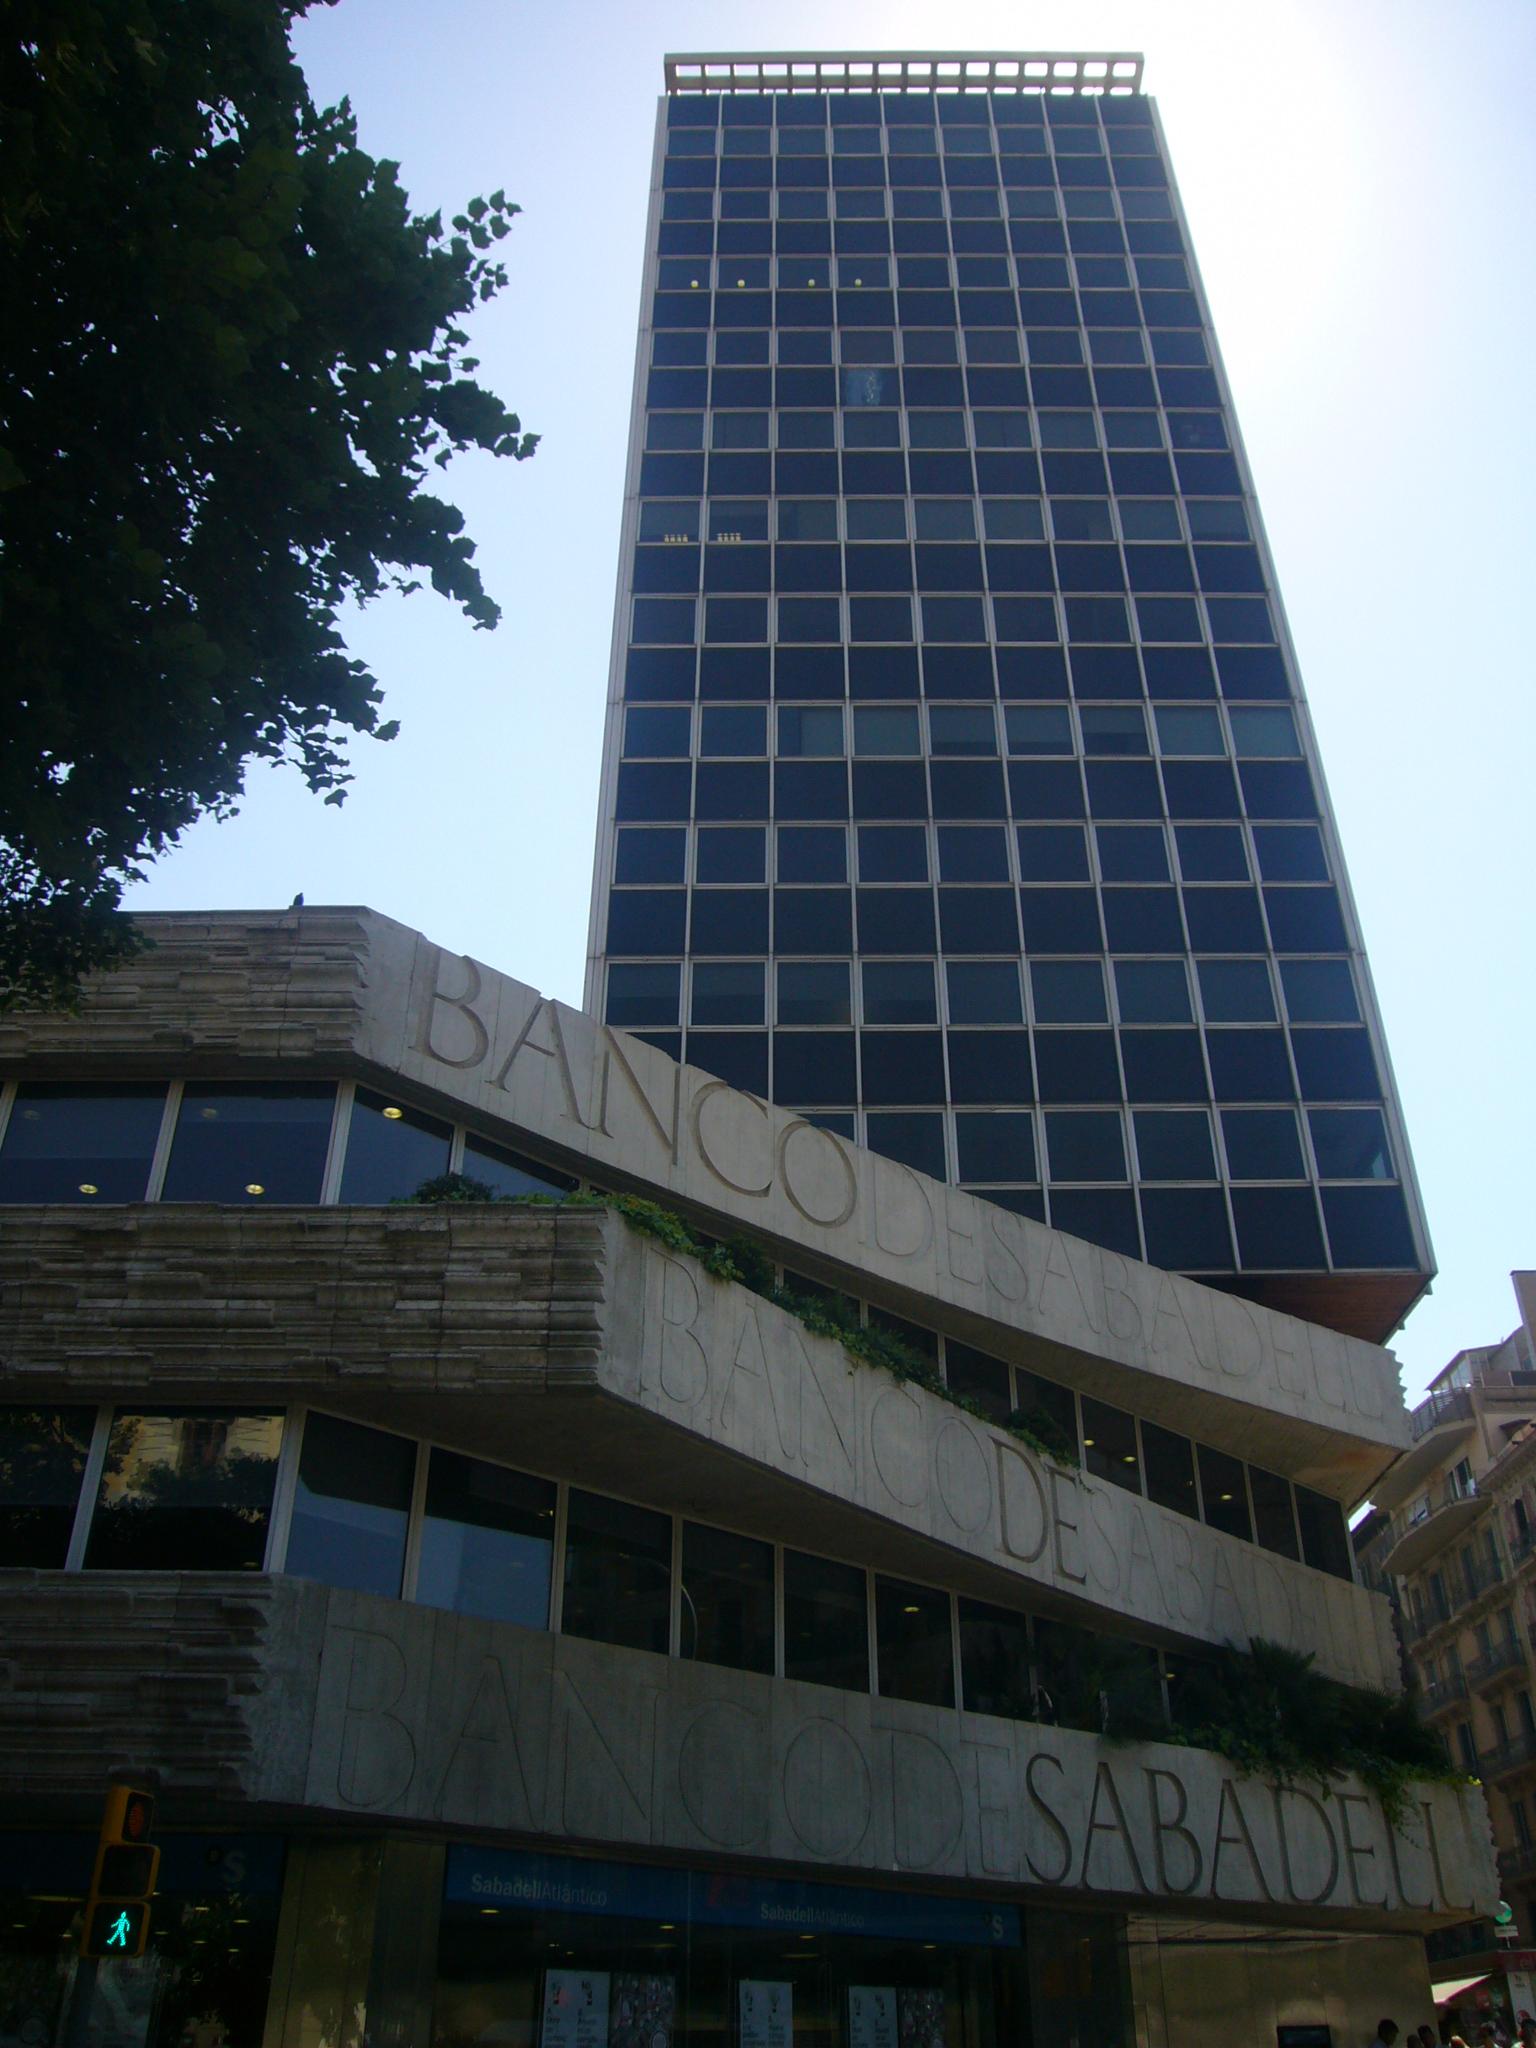 File banc de sabadell rambla de catalunya rossell jpg - Oficinas banc sabadell barcelona ...